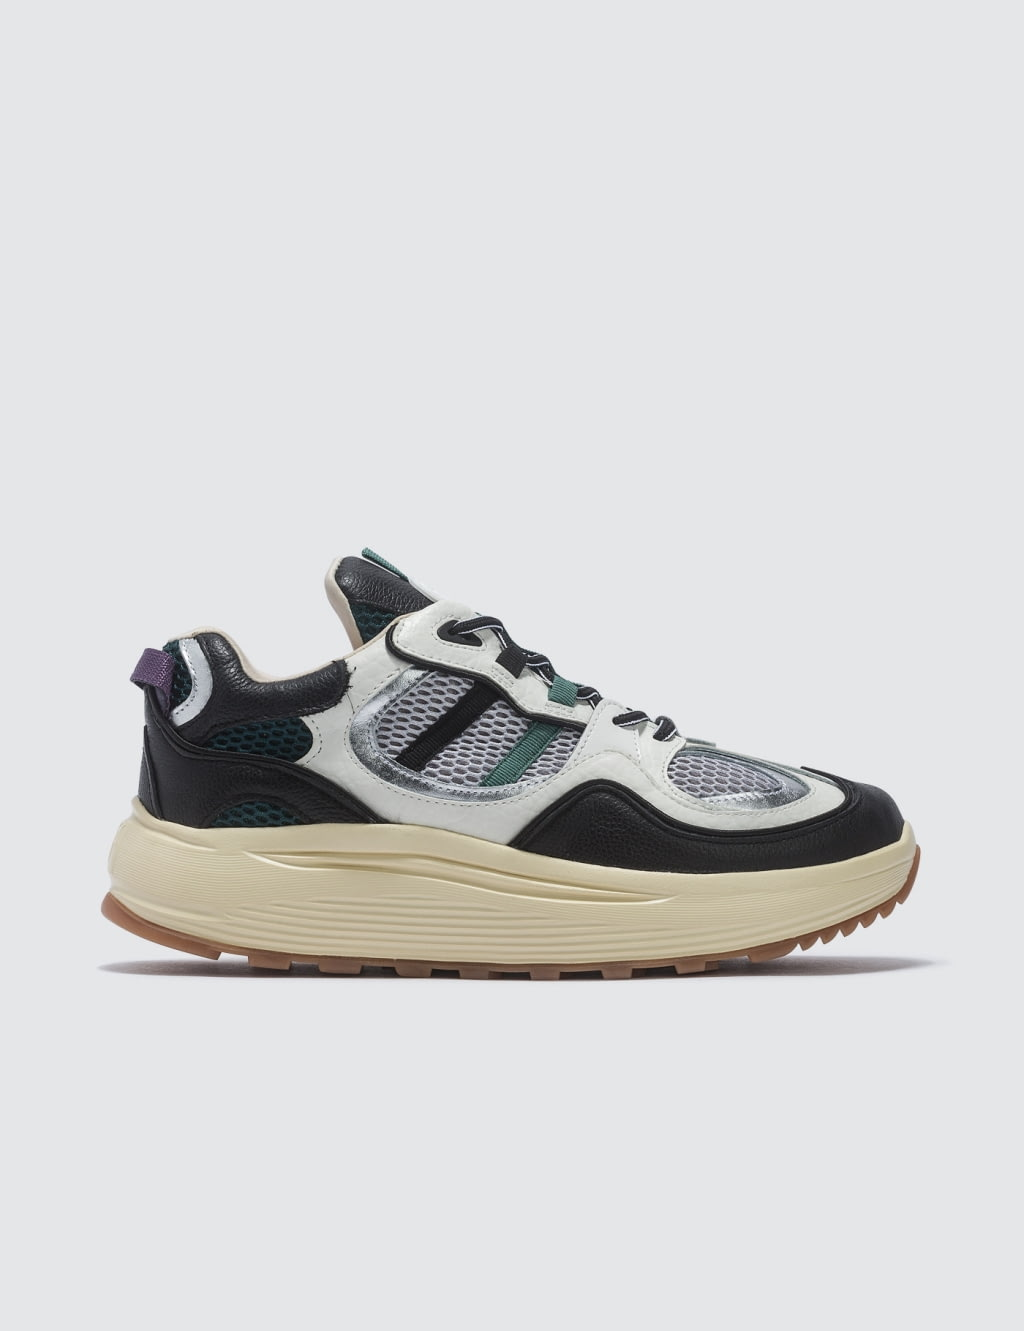 Eytys Jet Turbo Sneakers · Eytys Jet Turbo Sneakers